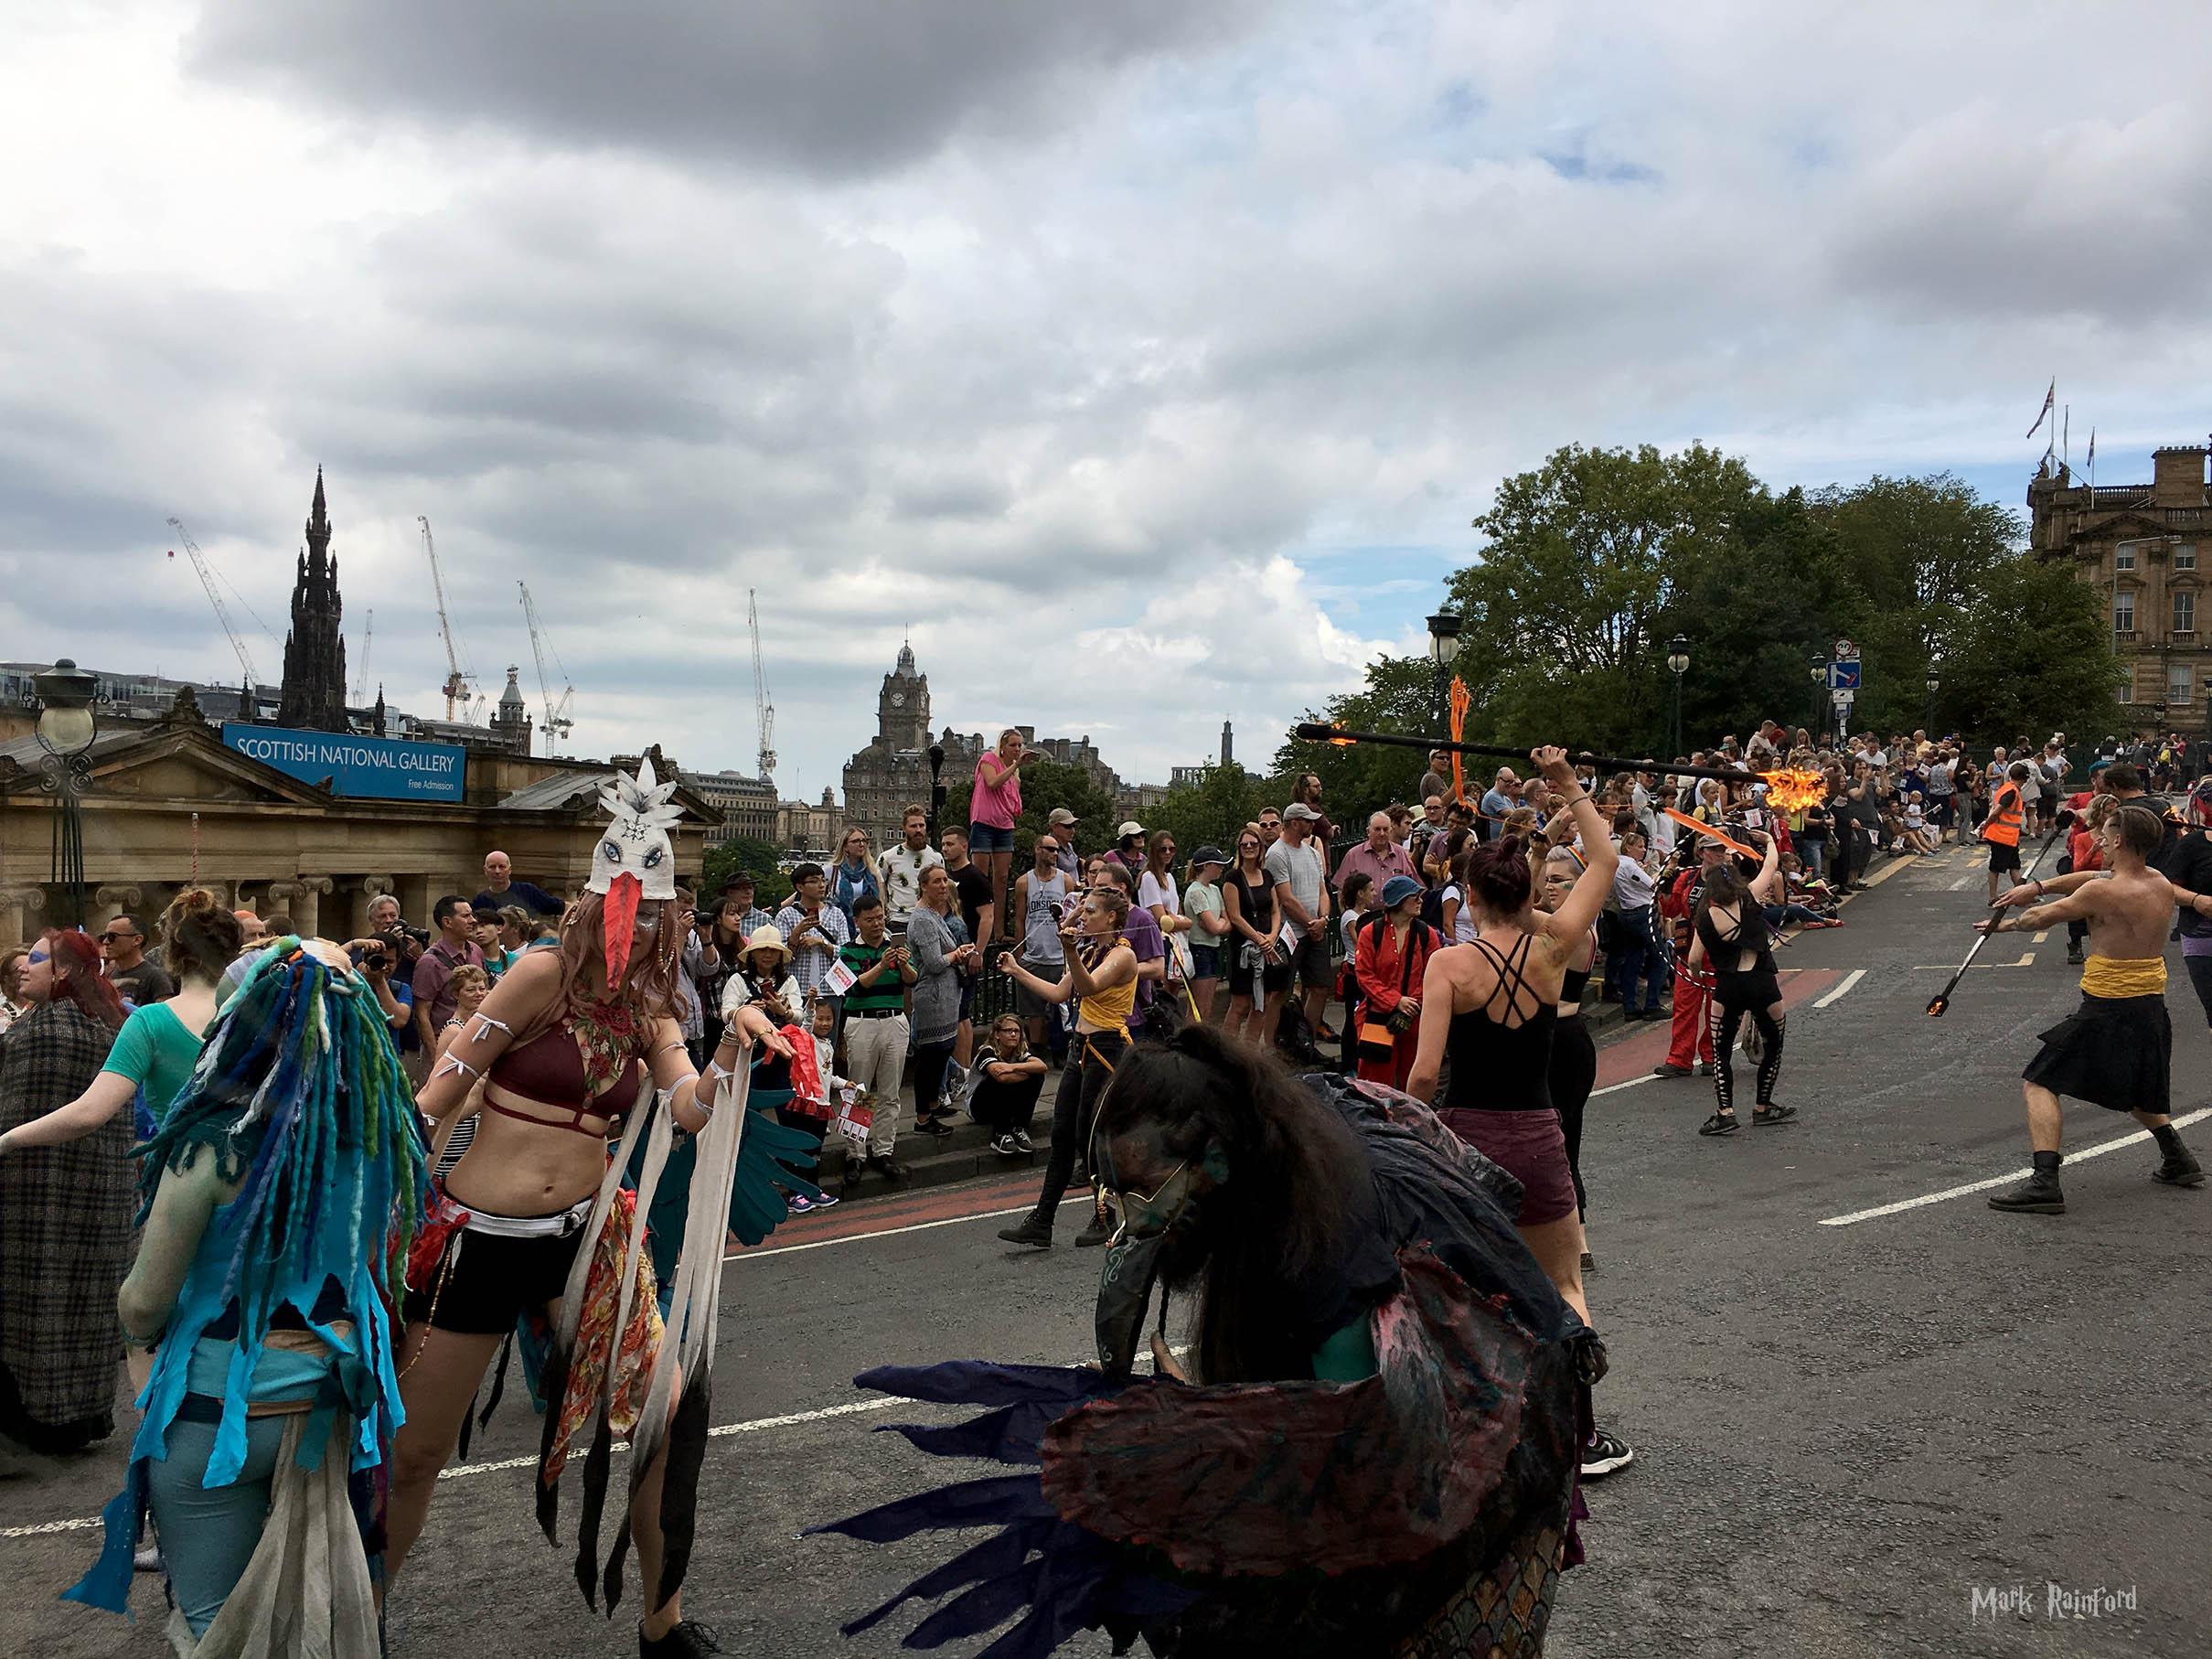 Edinburgh Festival Cavalcade 2018 Fire